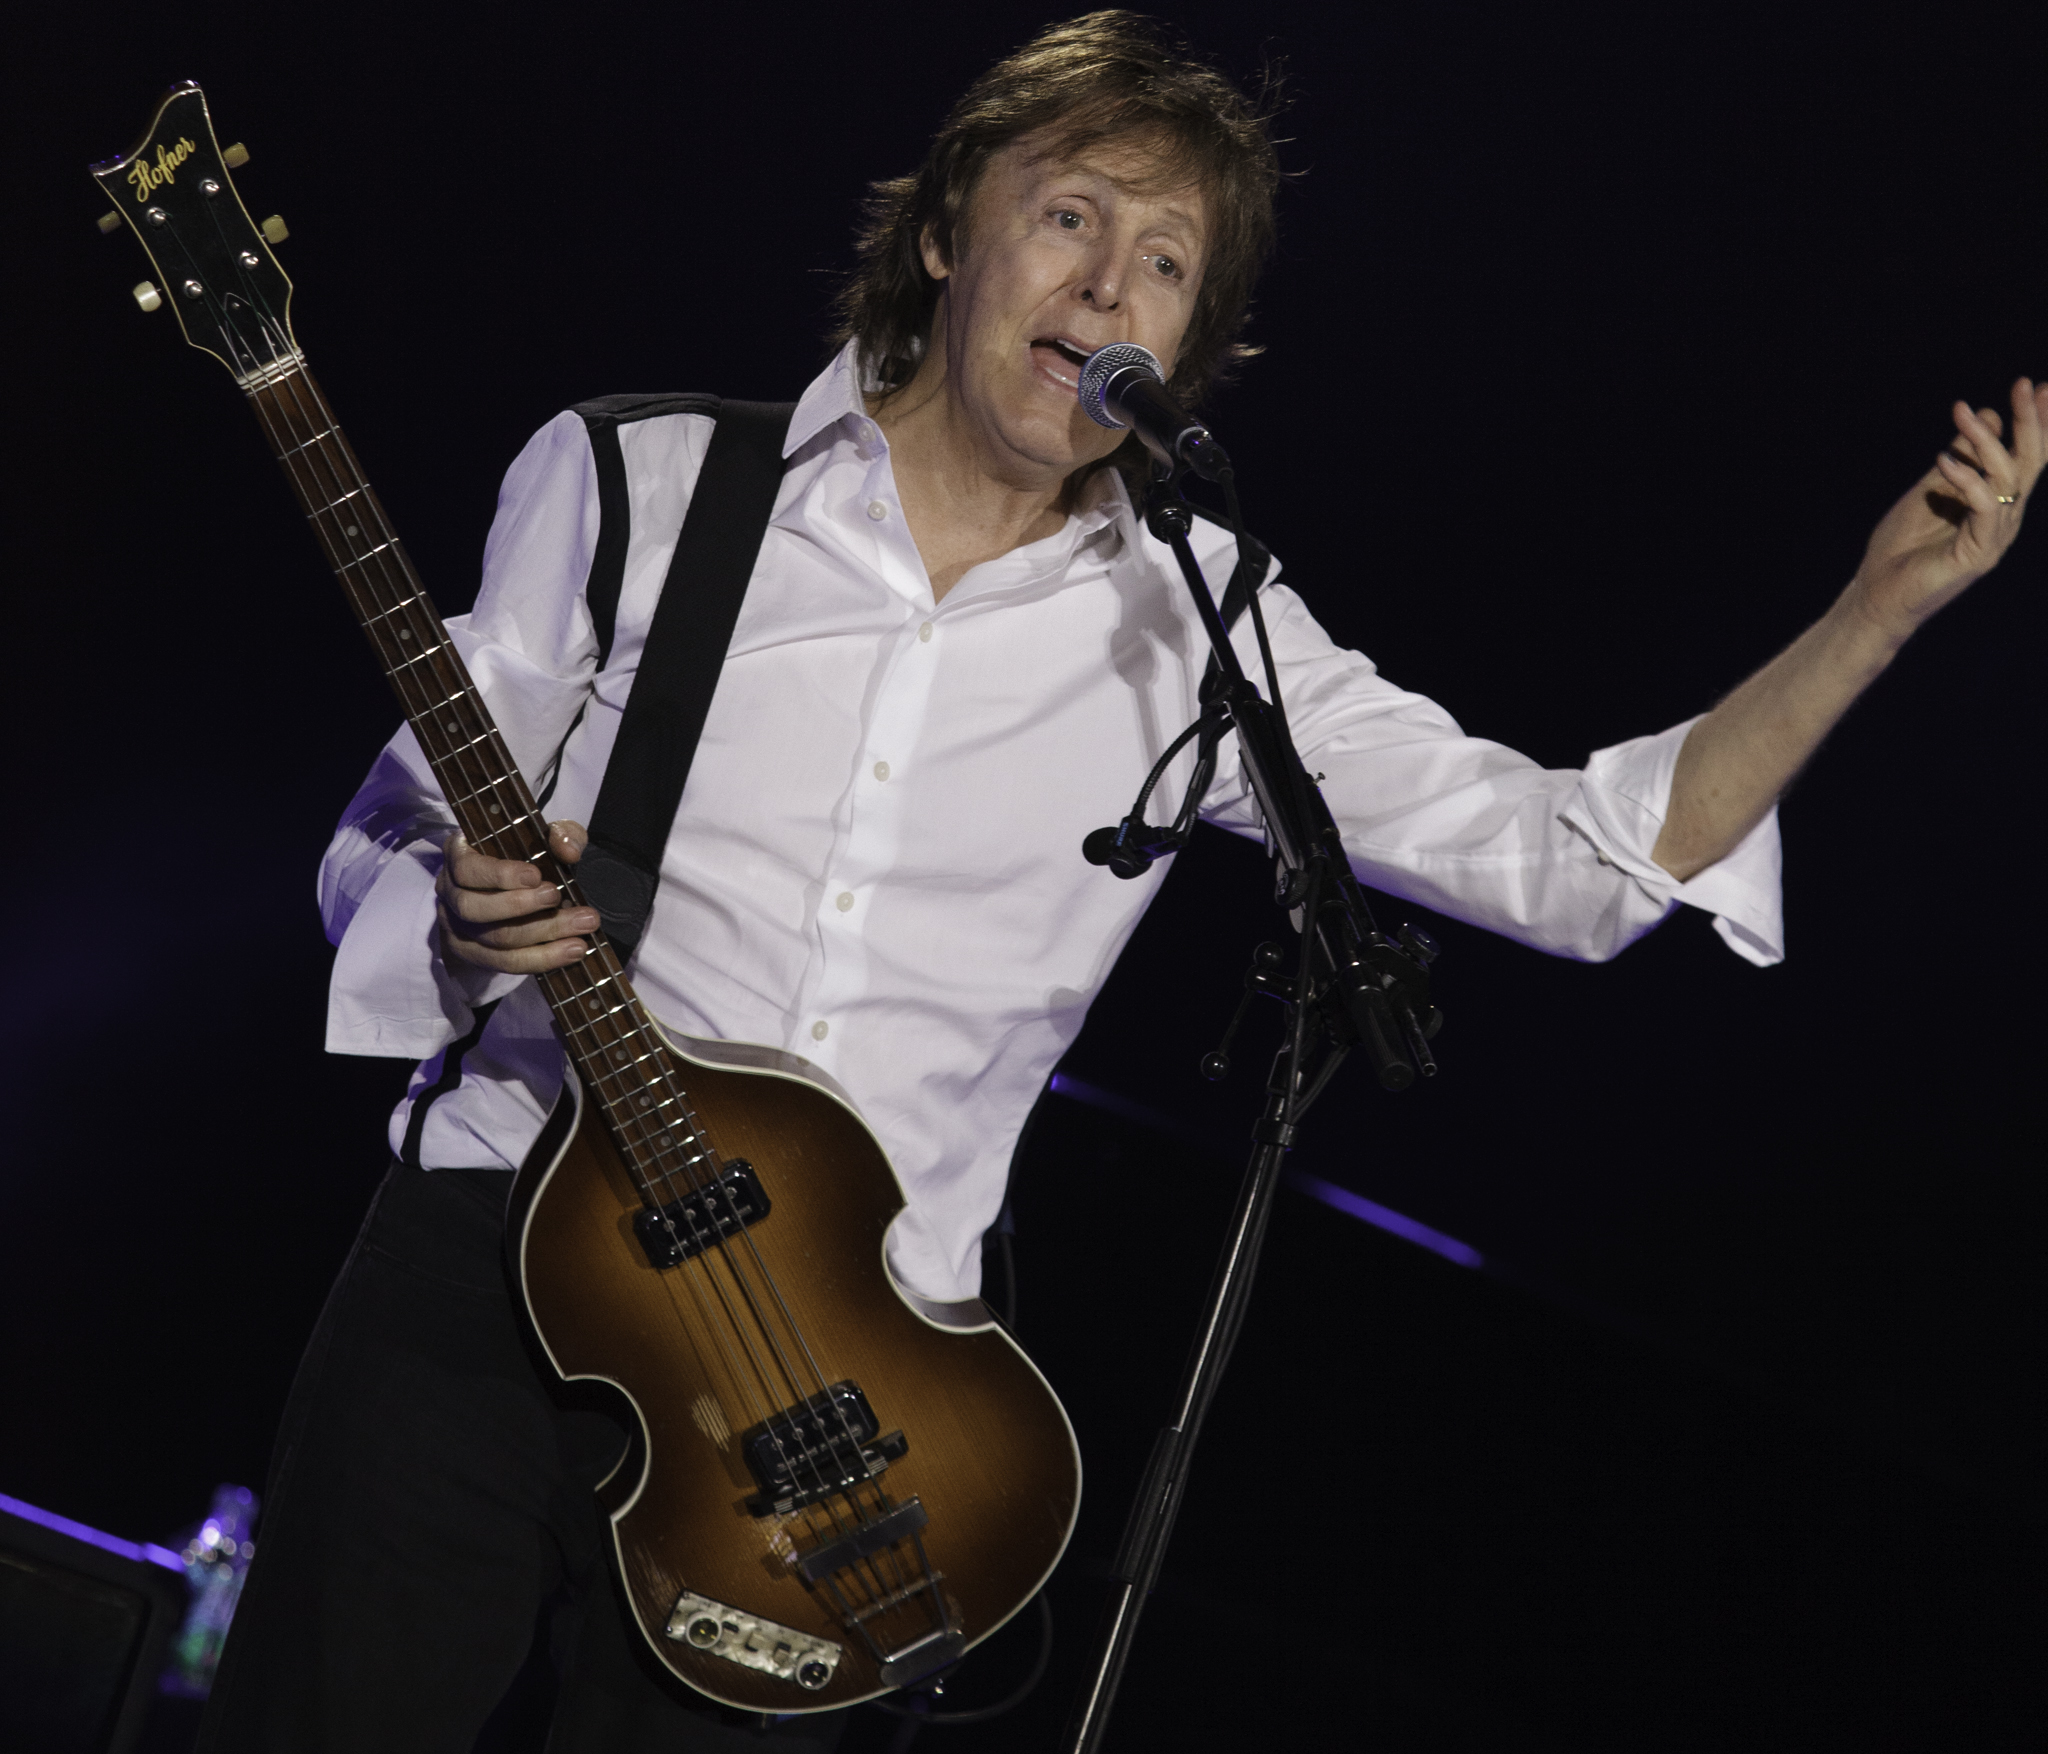 Paul McCartney - Out There Concert | 140420-5806-jikatu